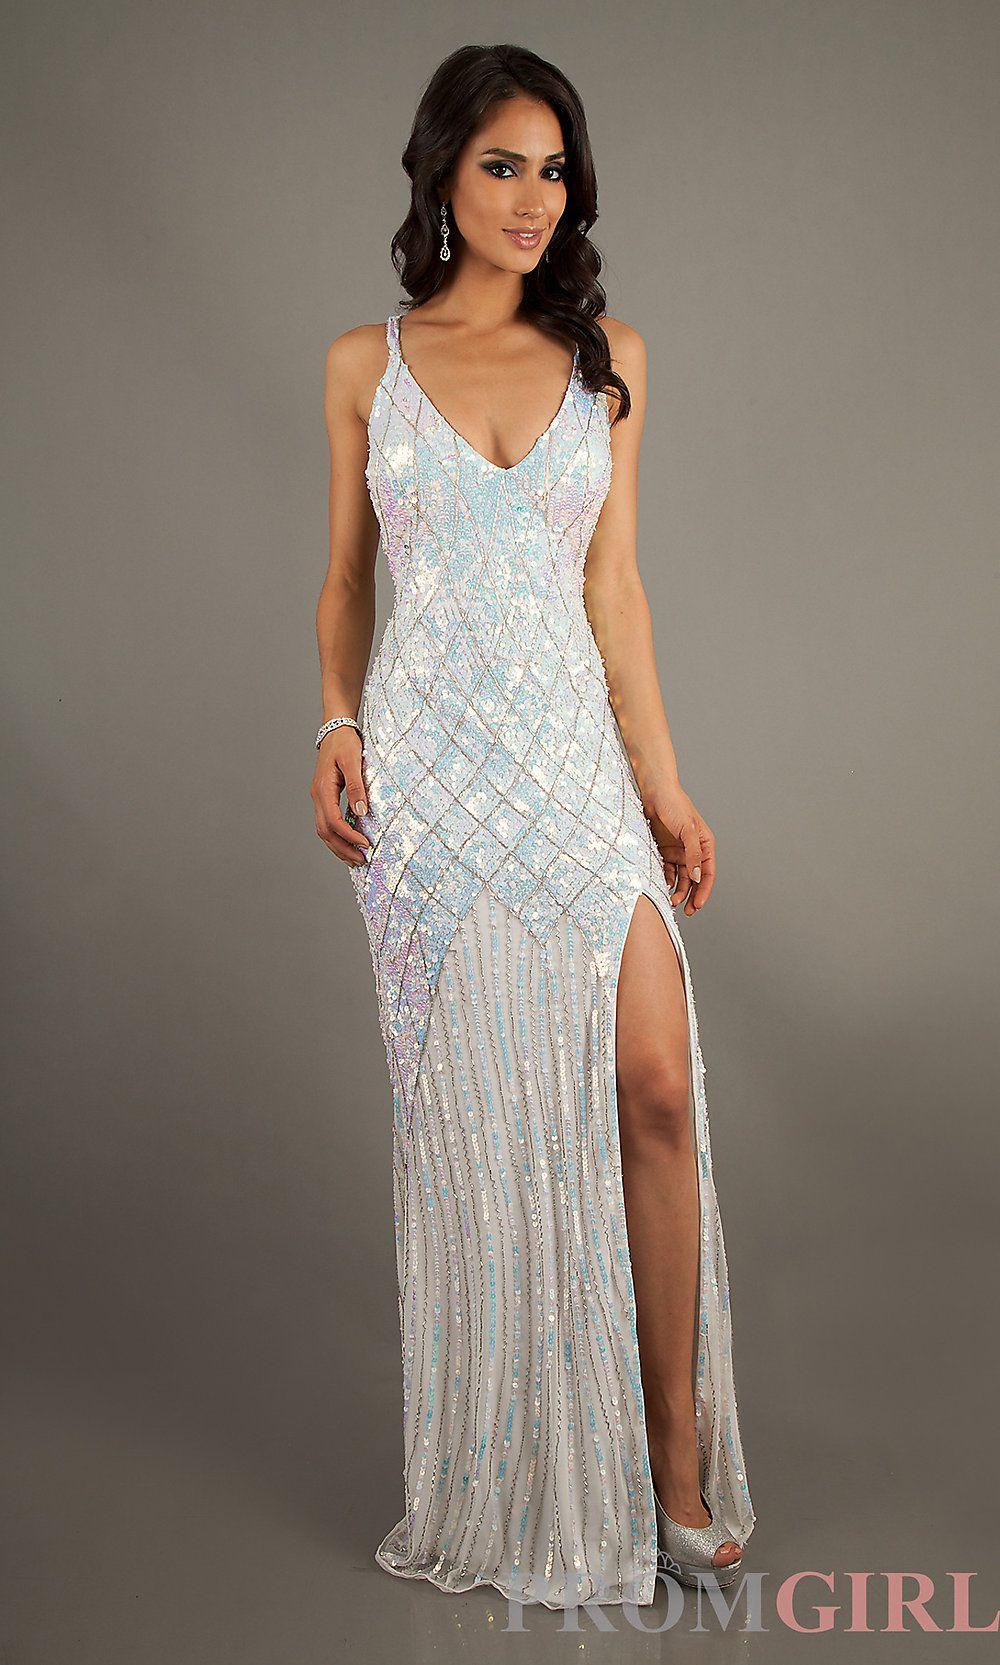 Long Sequin Prom Dresses, Primavera Sequin Formal Gowns- PromGirl ...